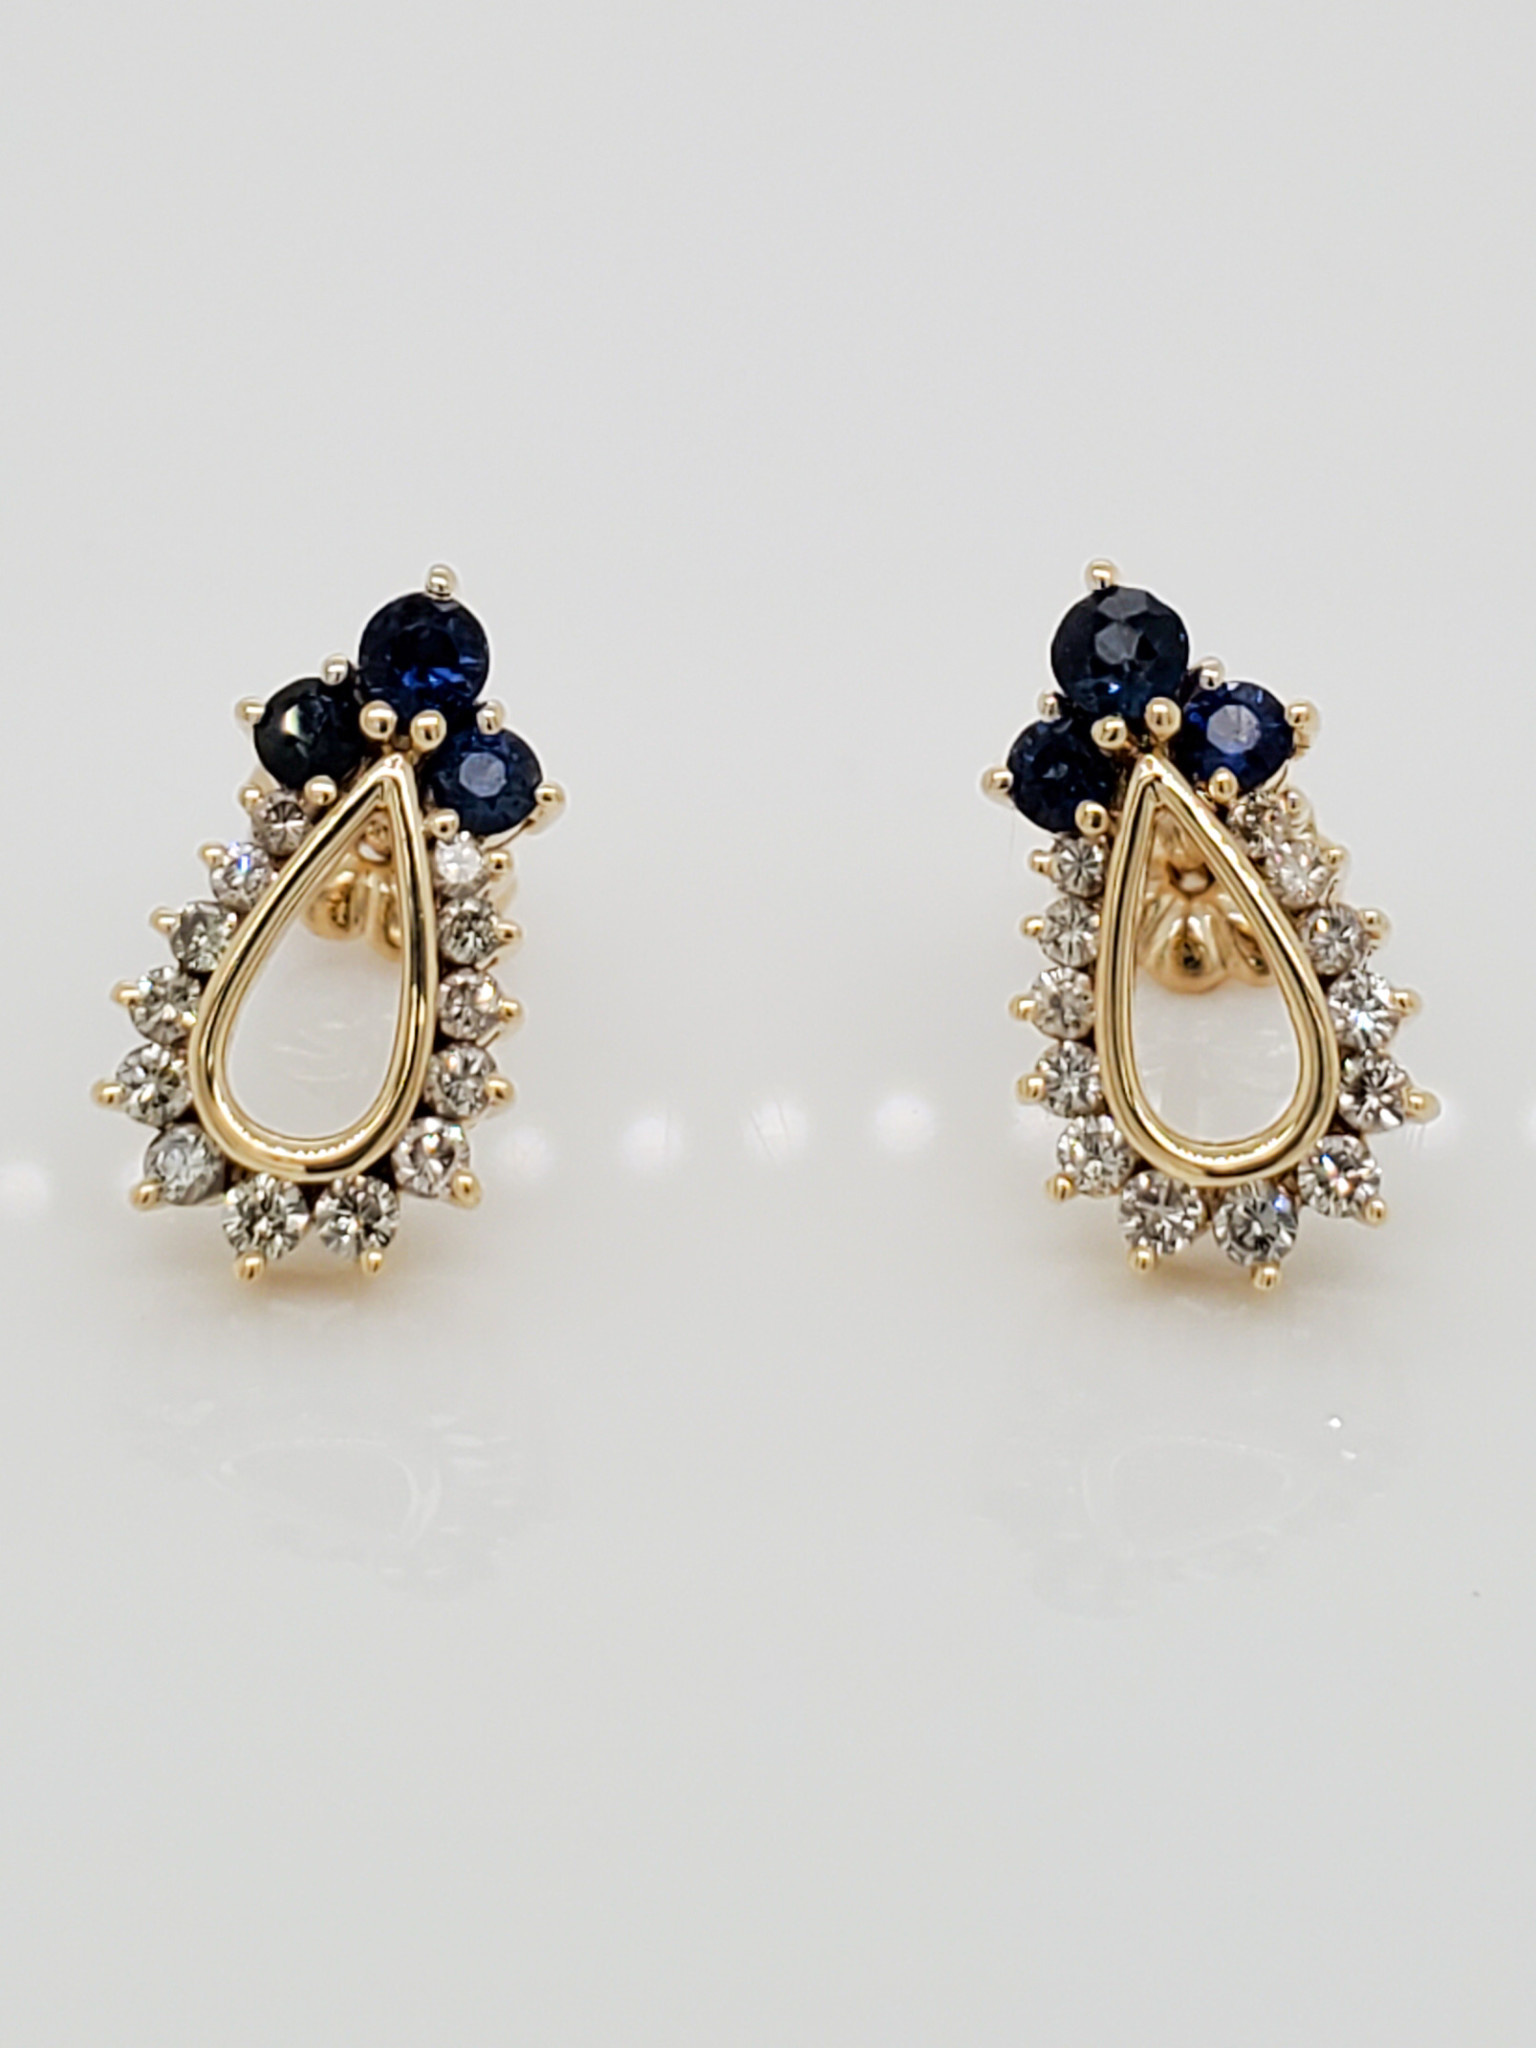 14KT Yellow Gold Estate Sapphire & Diamond Stud Earrings